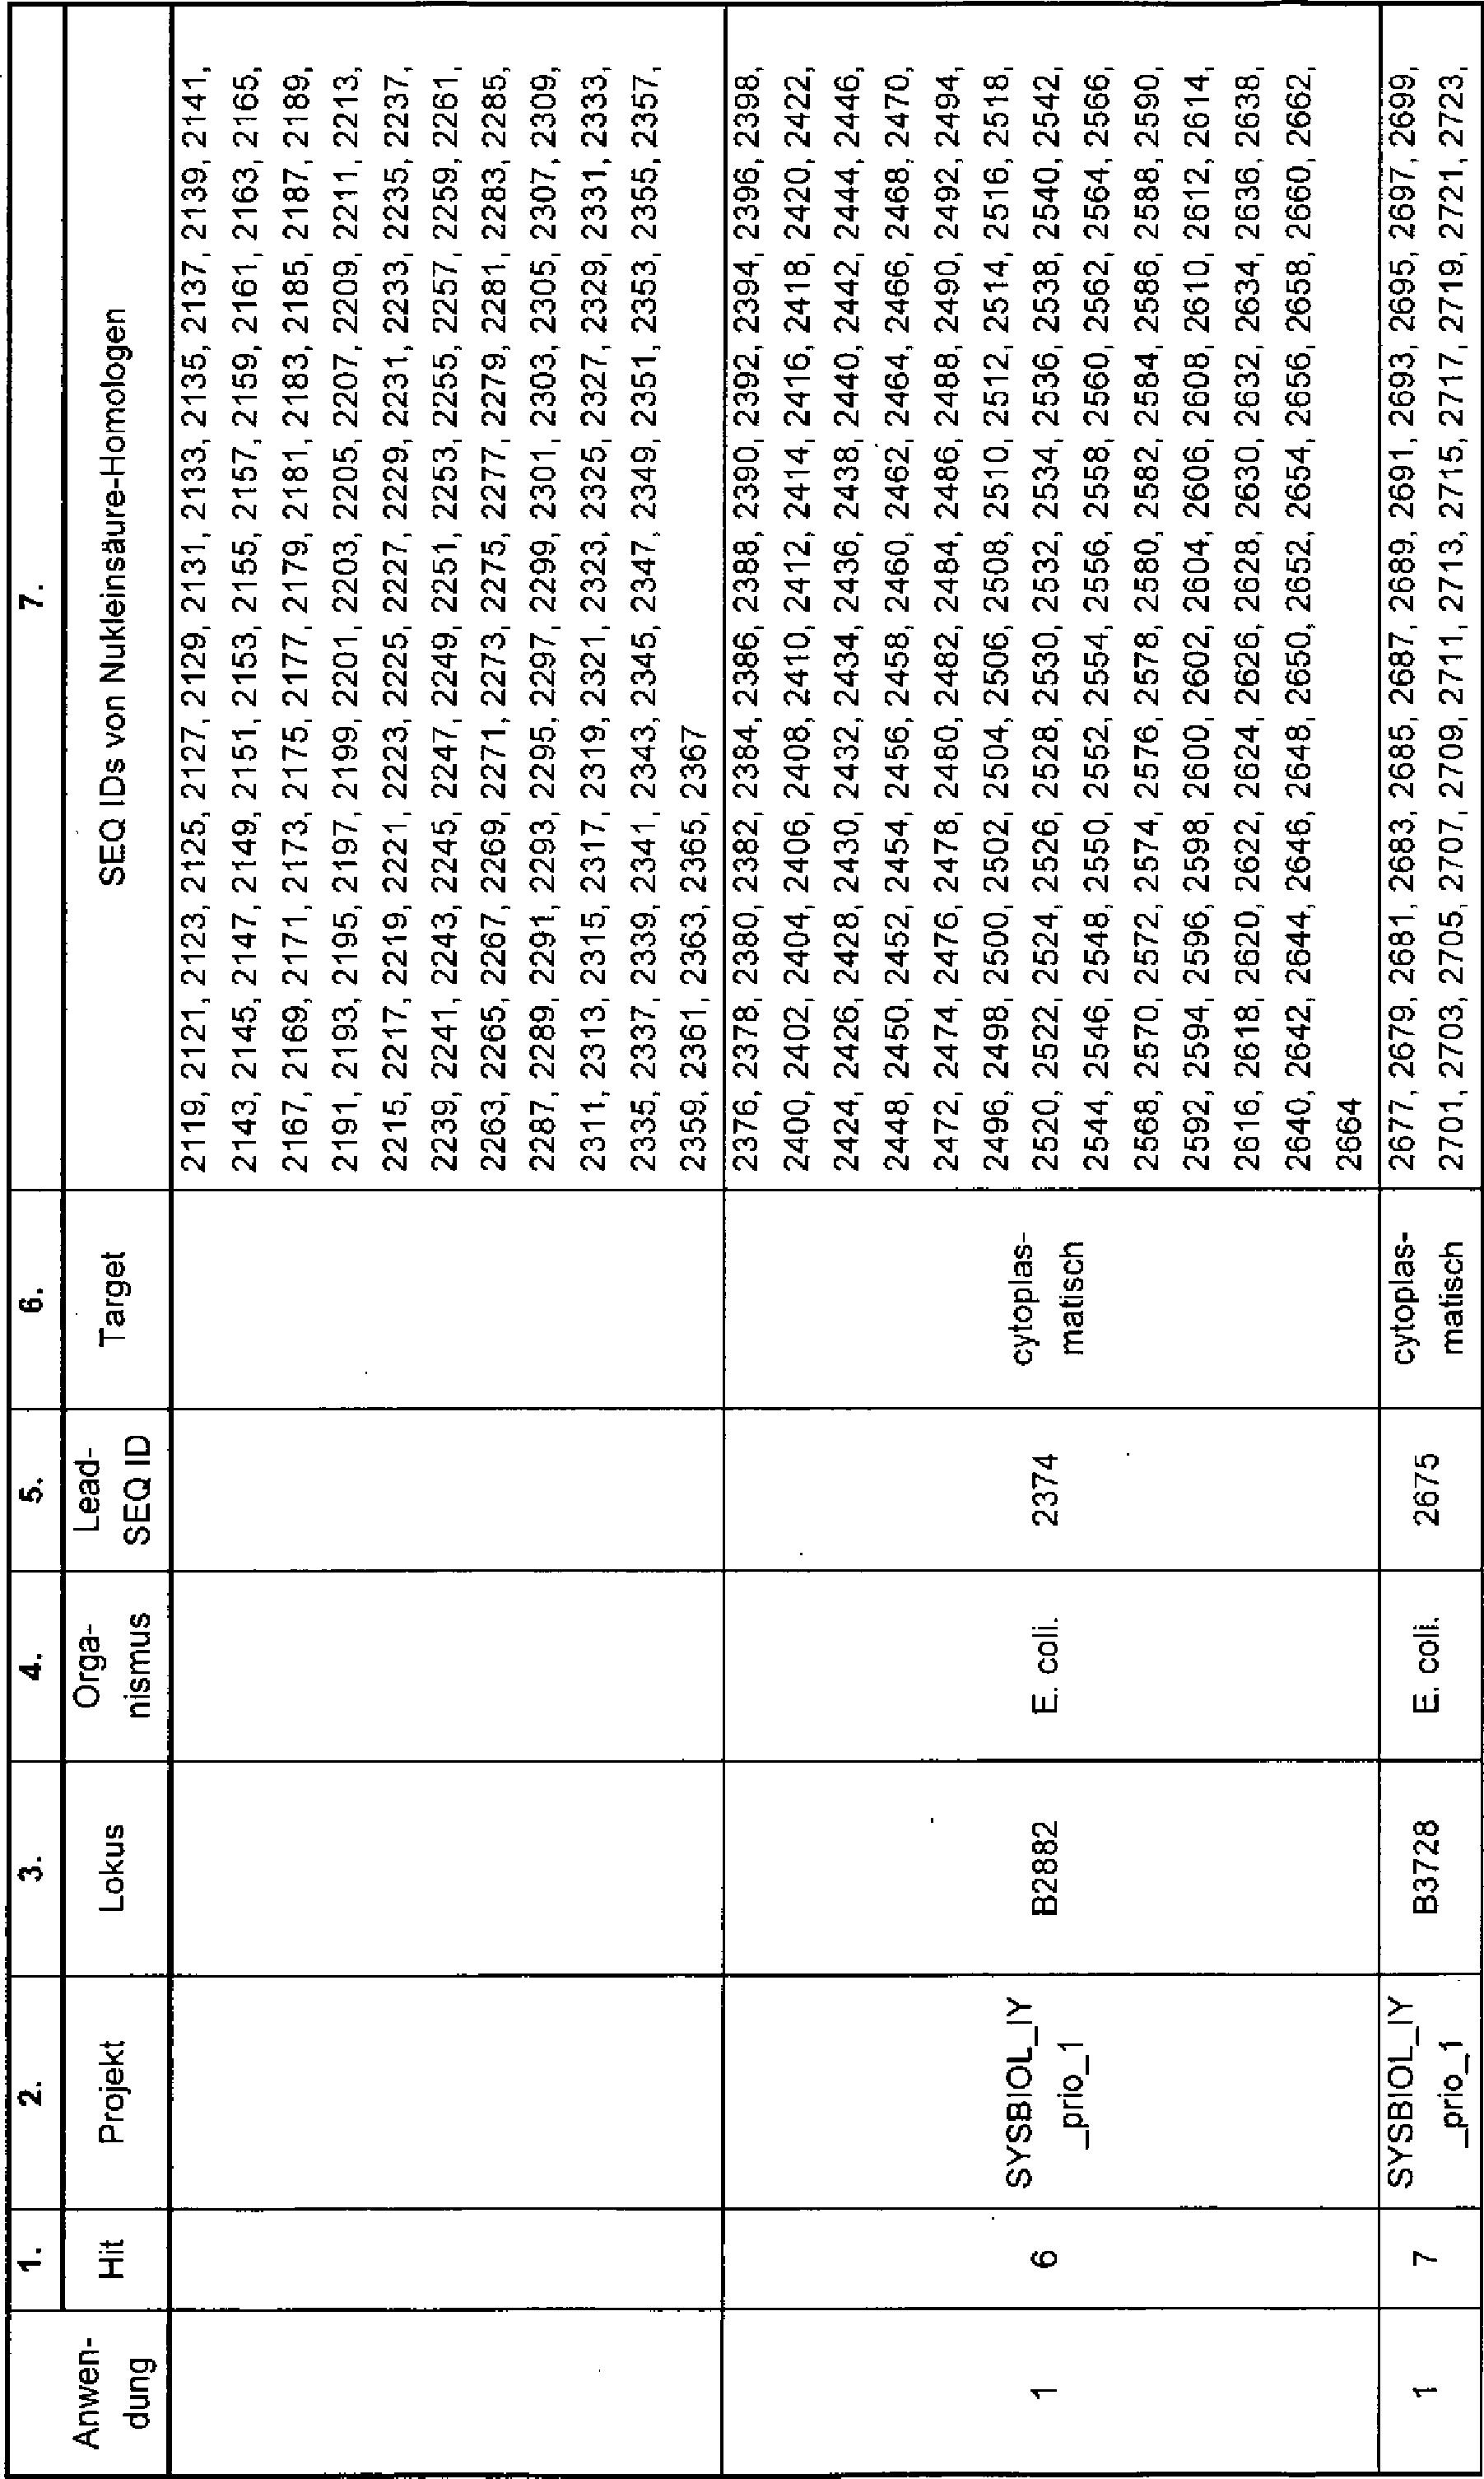 DE112010003032T5 - Pflanzen mit erhöhtem Ertrag - Google Patents